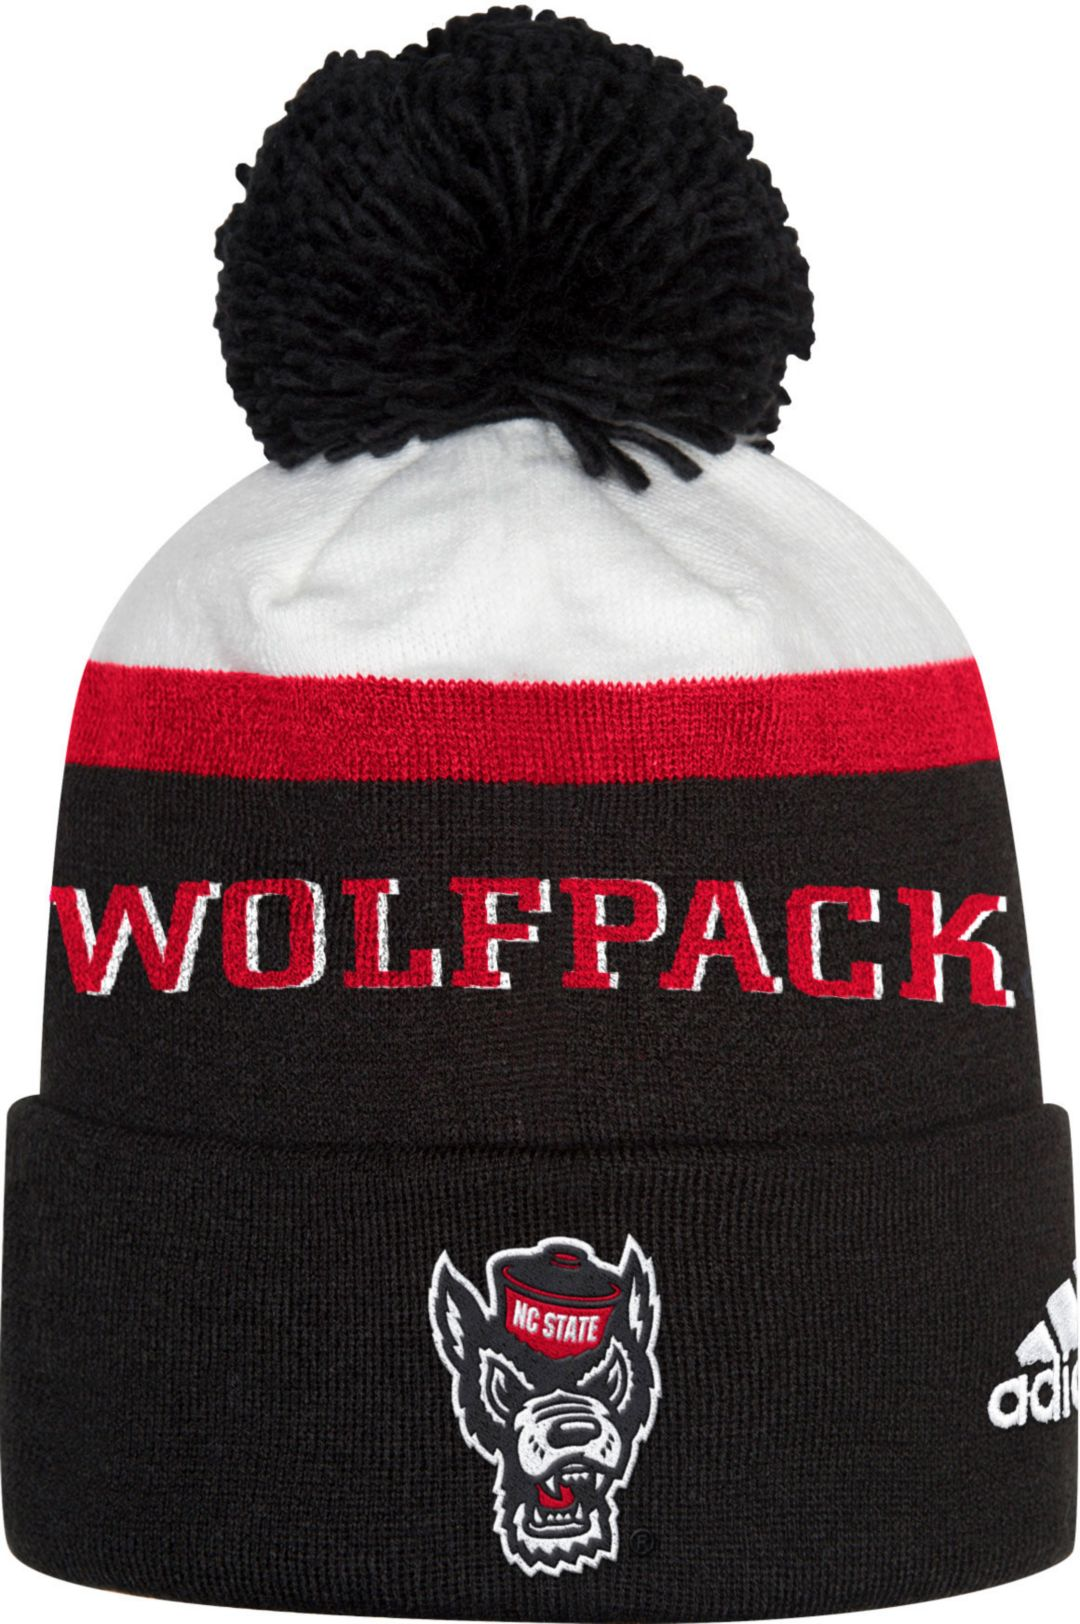 a0850b8c72337 adidas Men s NC State Wolfpack Cuffed Pom Knit Black Beanie 1